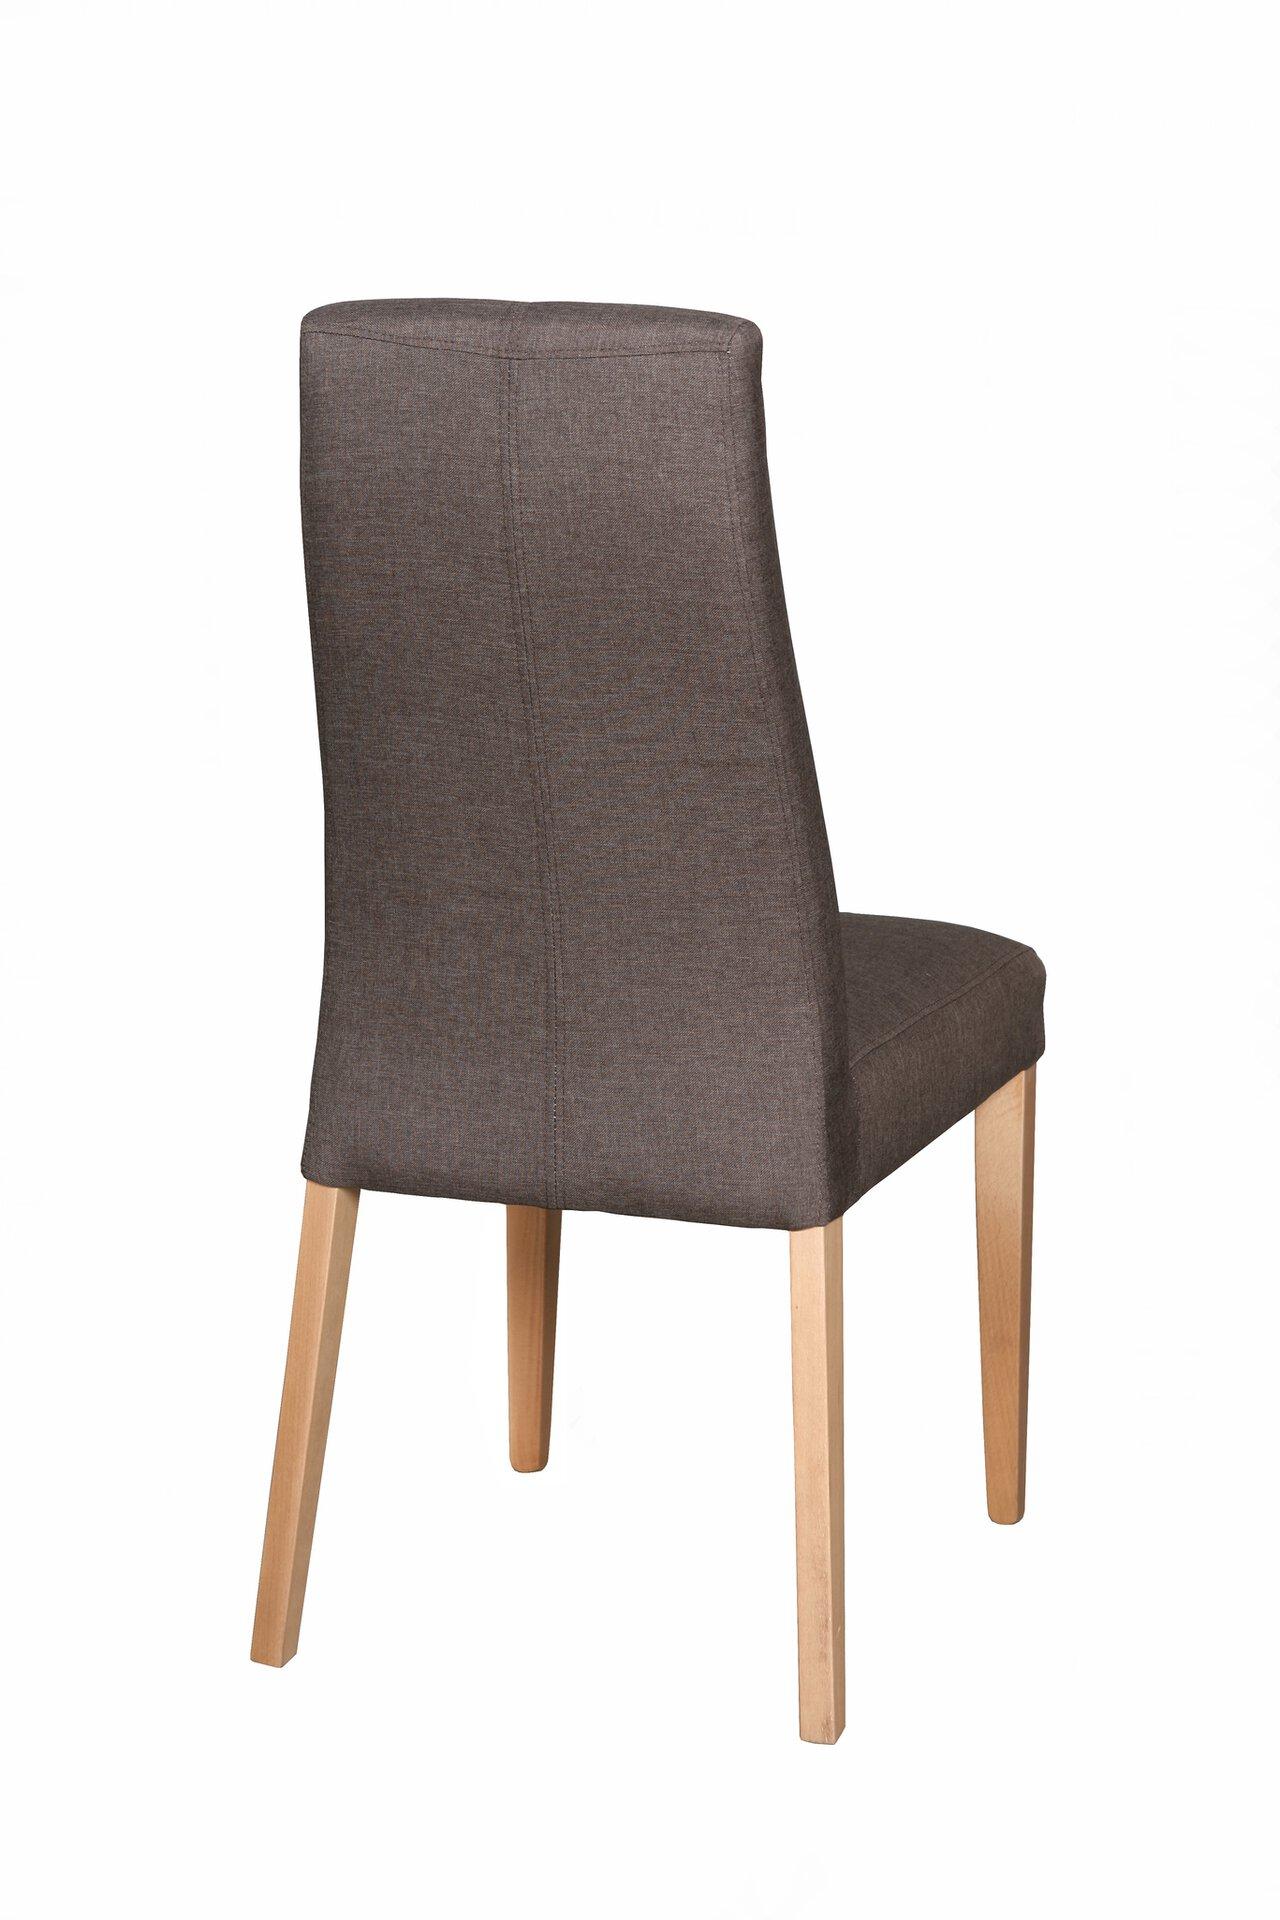 Stuhl TORON Vito Textil mehrfarbig 63 x 101 x 46 cm